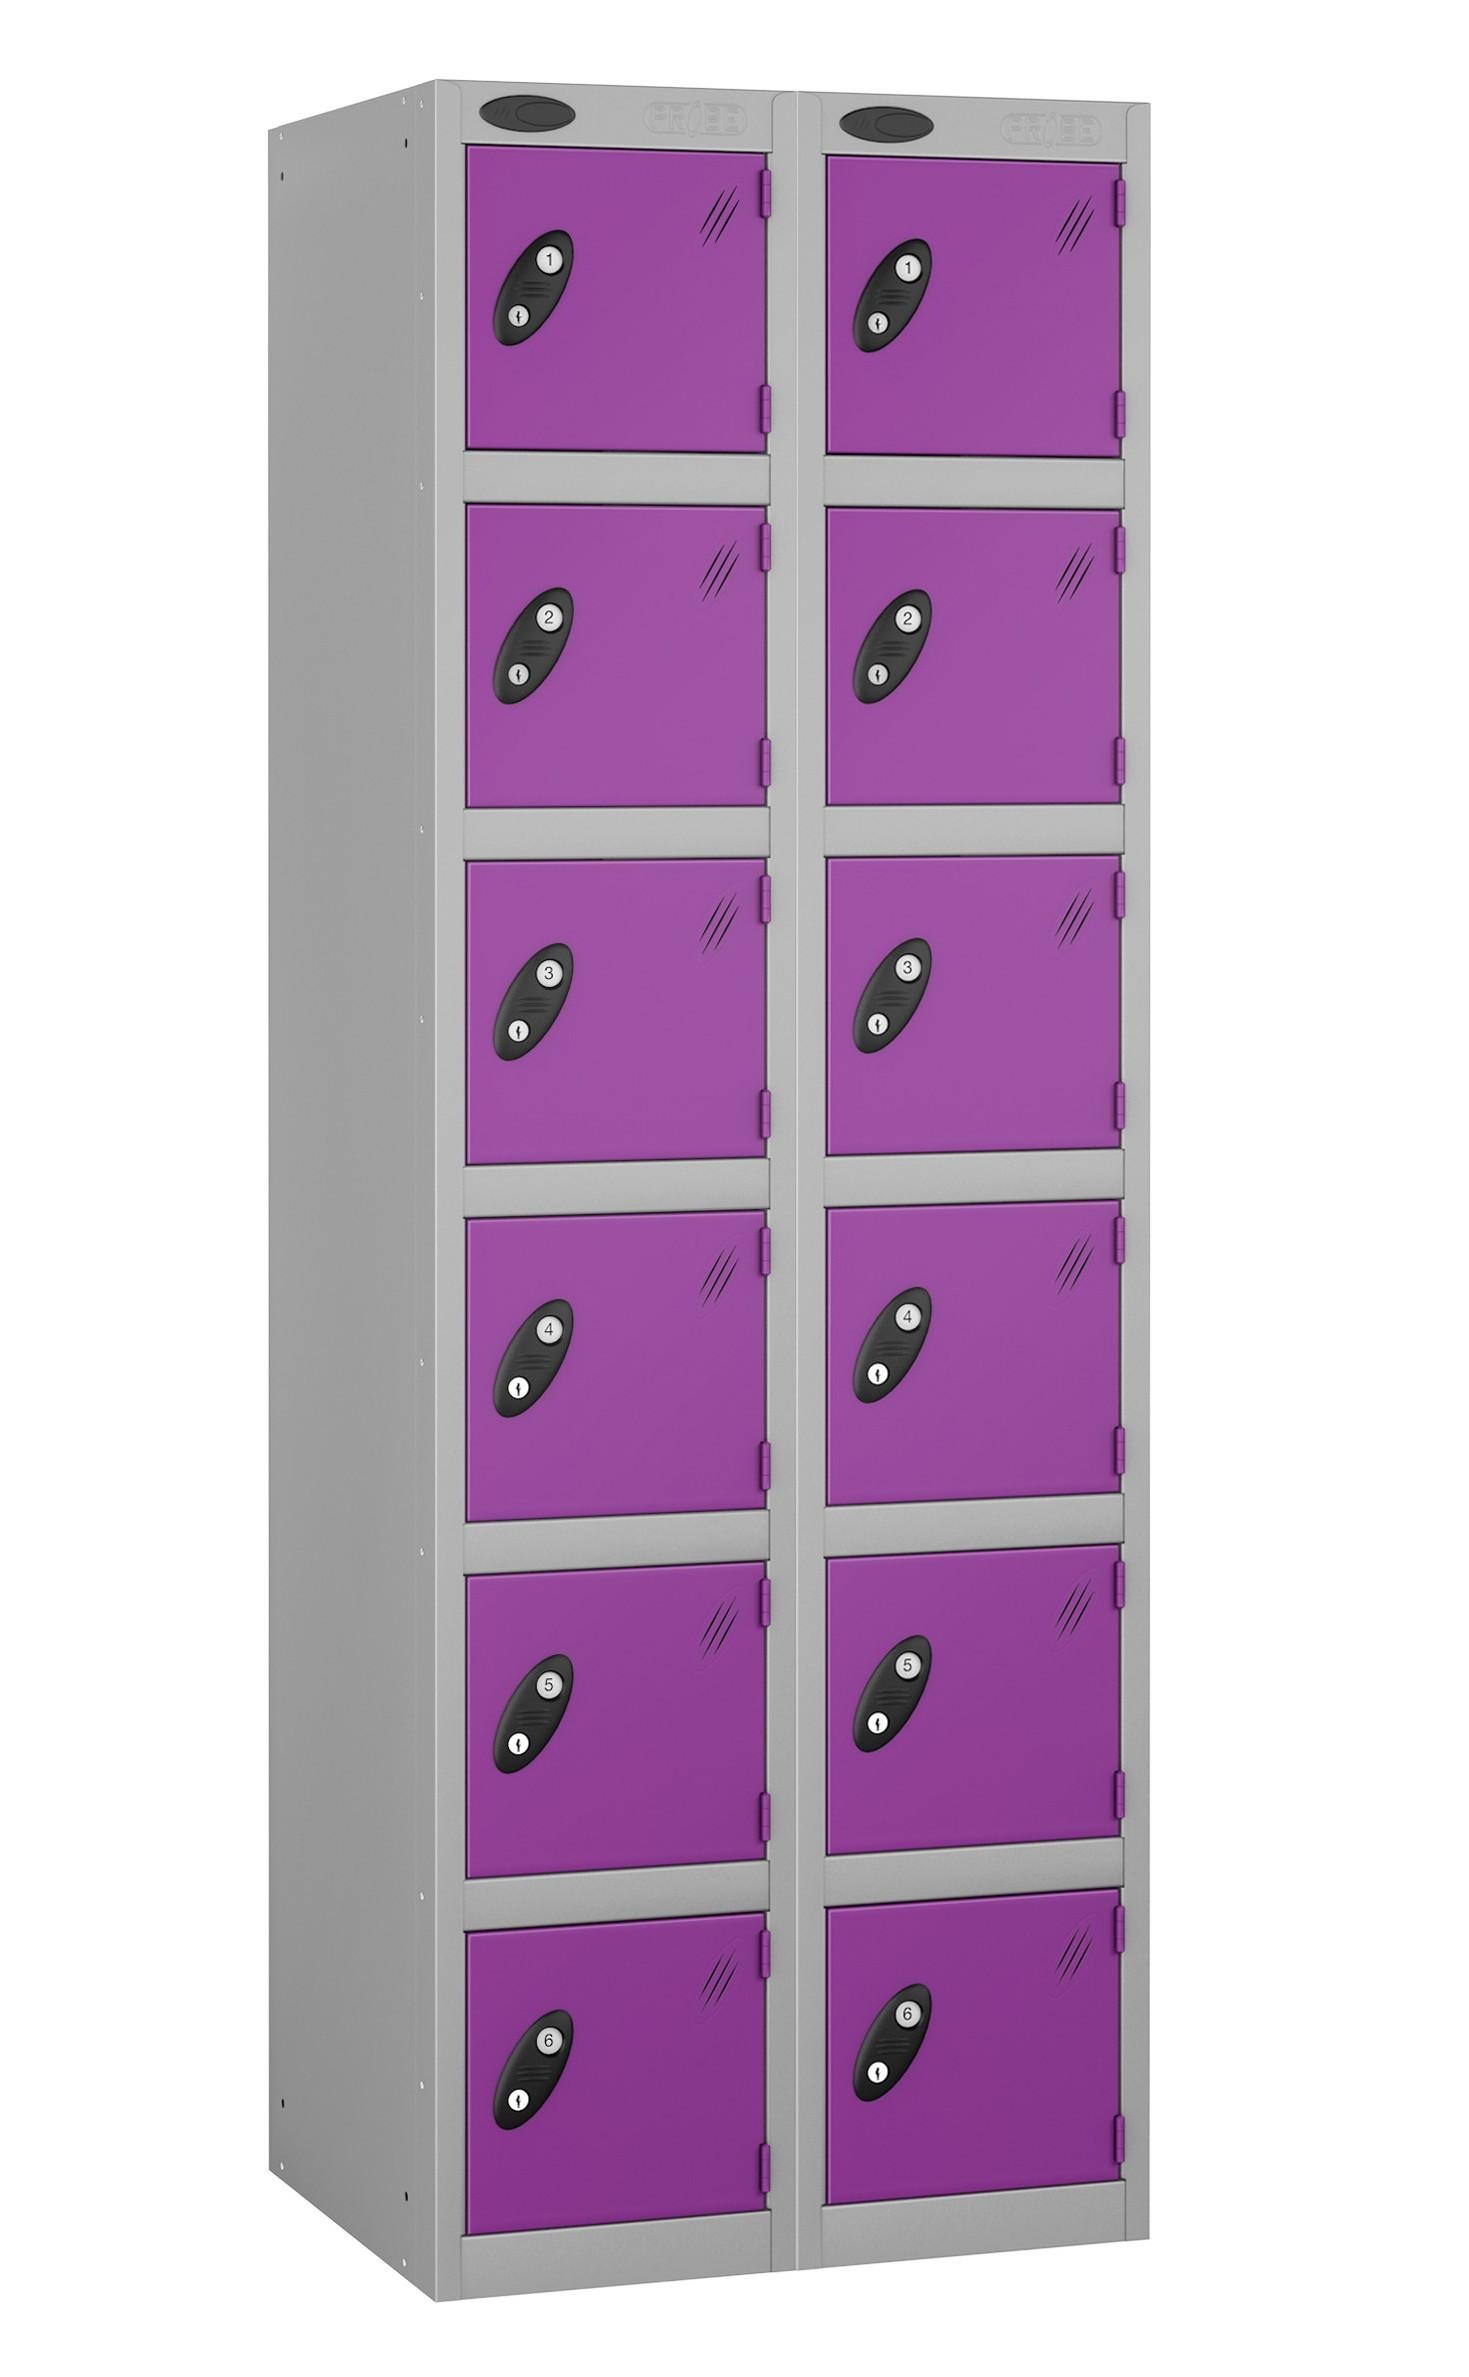 Colour Range Six Doors Locker - Nest of 2